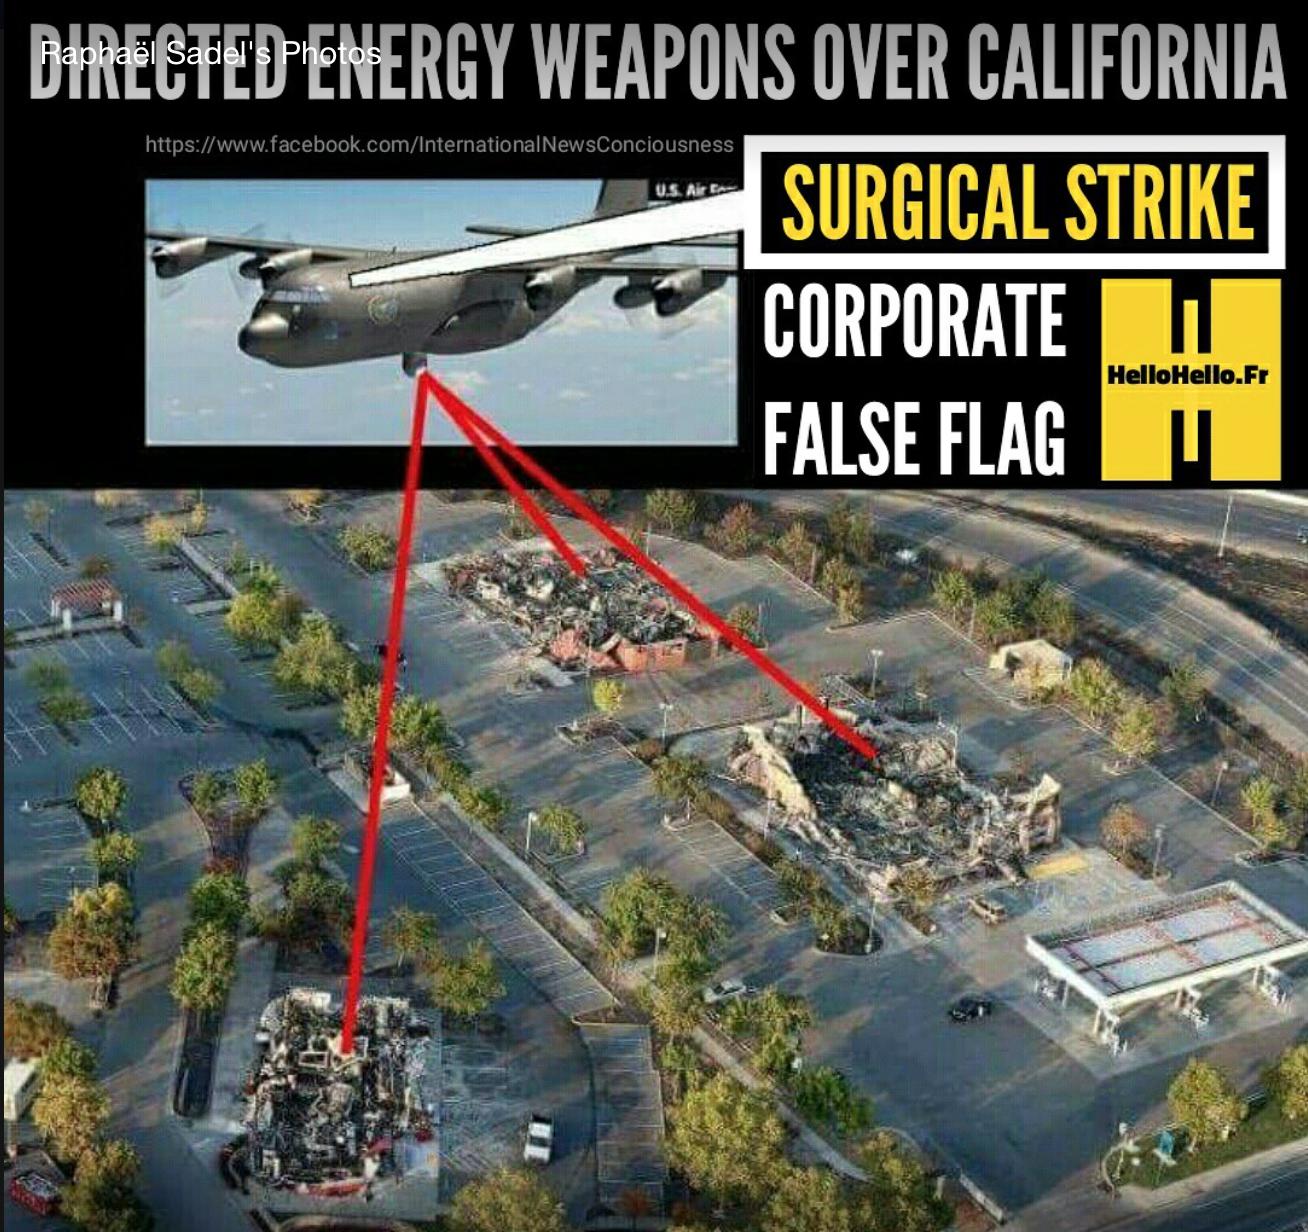 Some California DEW Attacks Were Actually Surgical Strikes (Photo